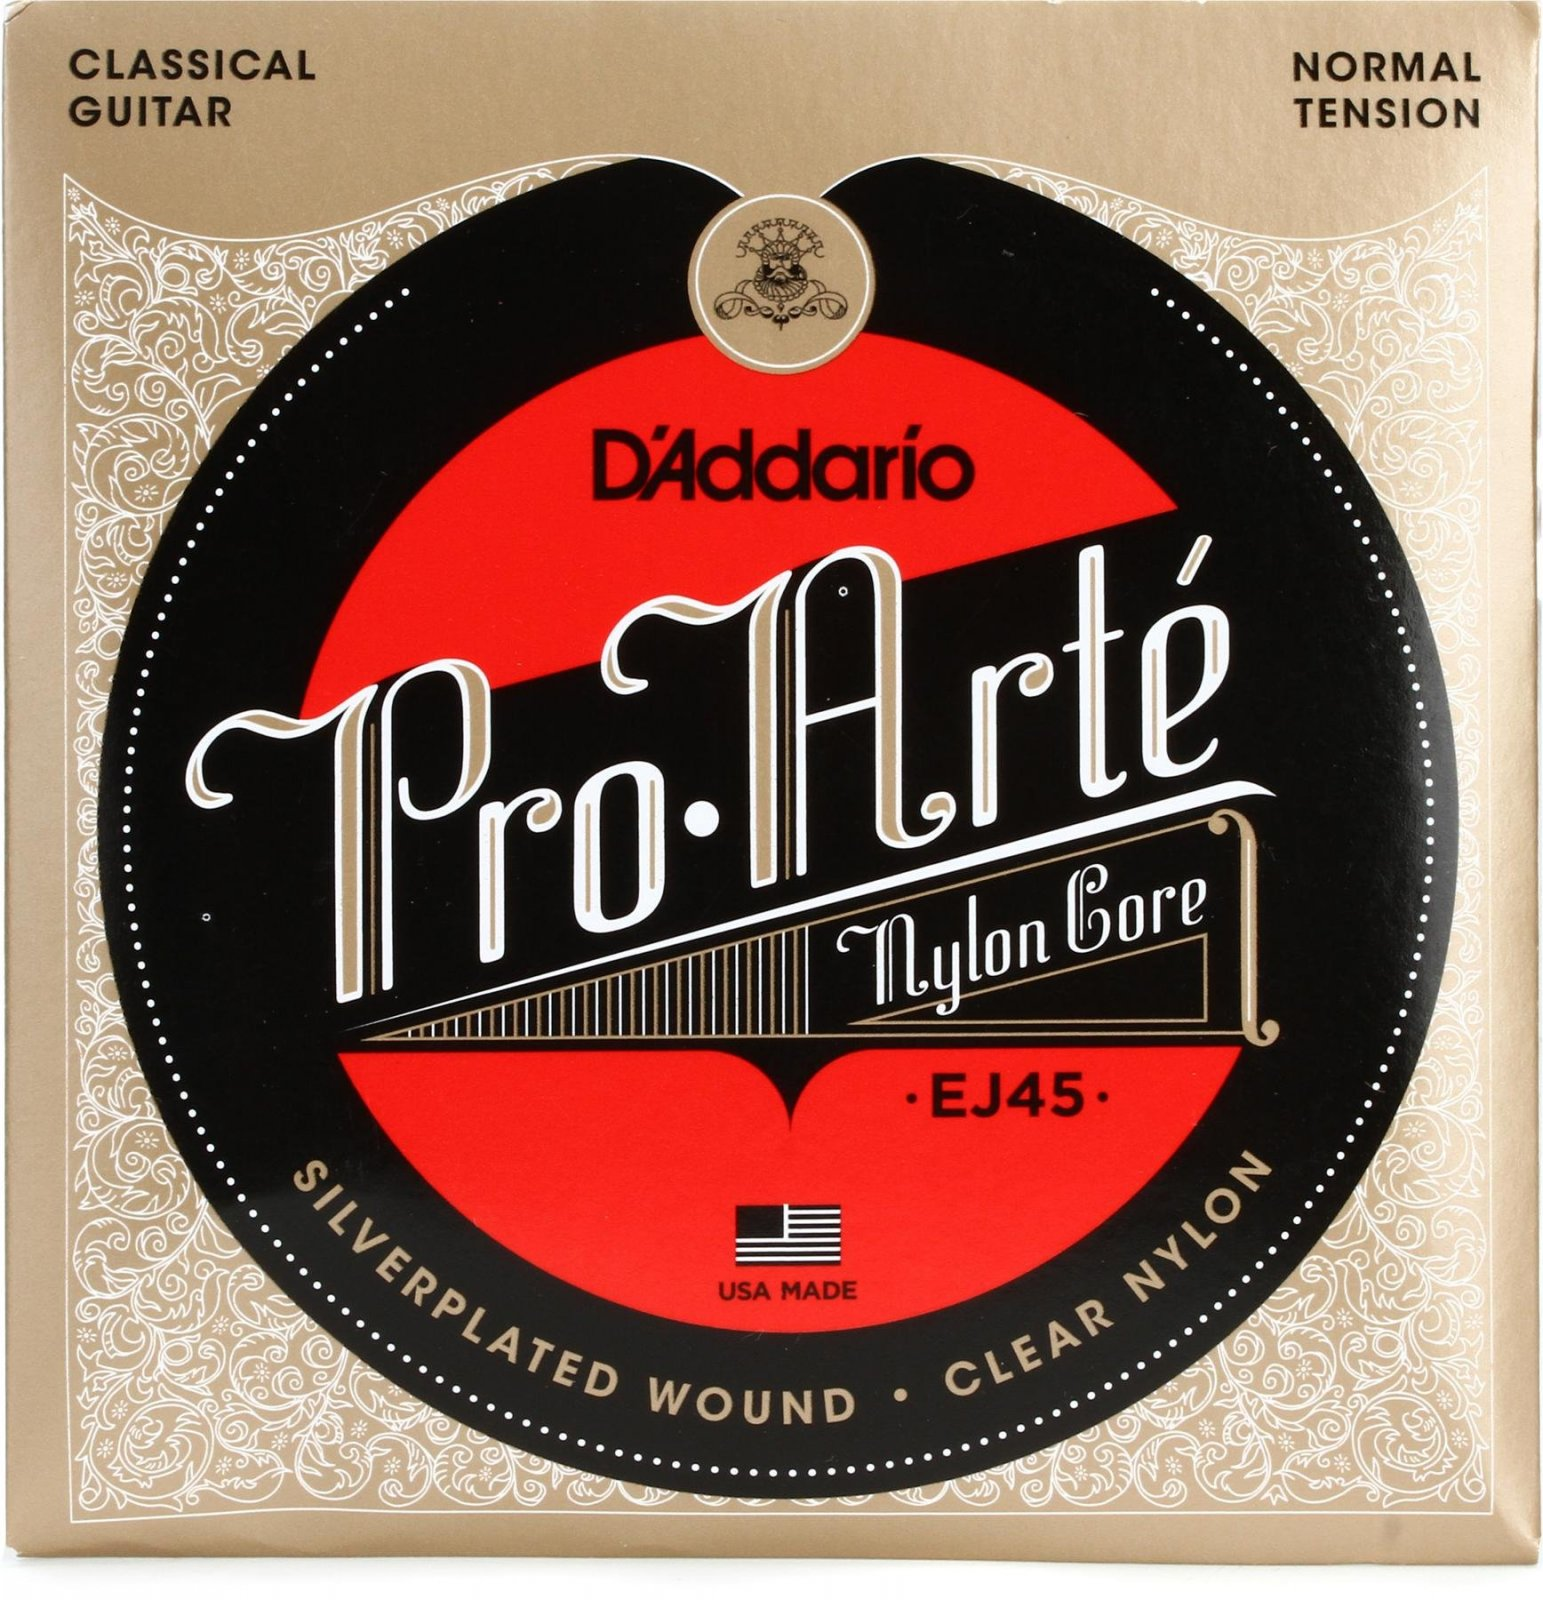 D'Addario EJ45 Pro-Arte Nylon - Normal Tension